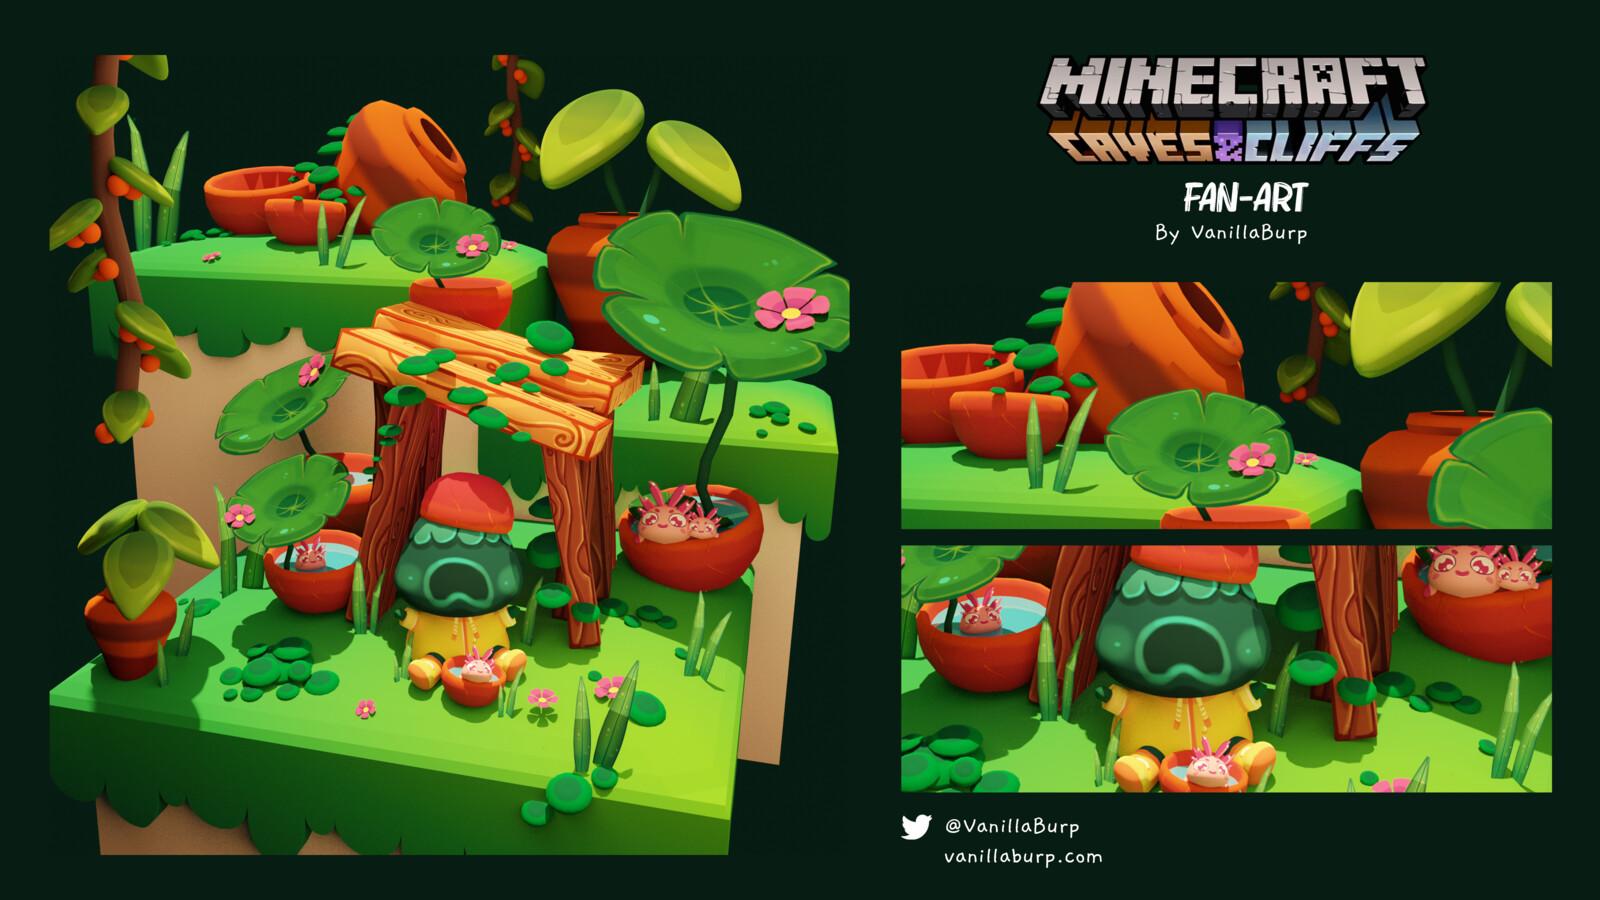 Cozy Lush Caves [Minecraft Caves & Cliffs Fan-Art]